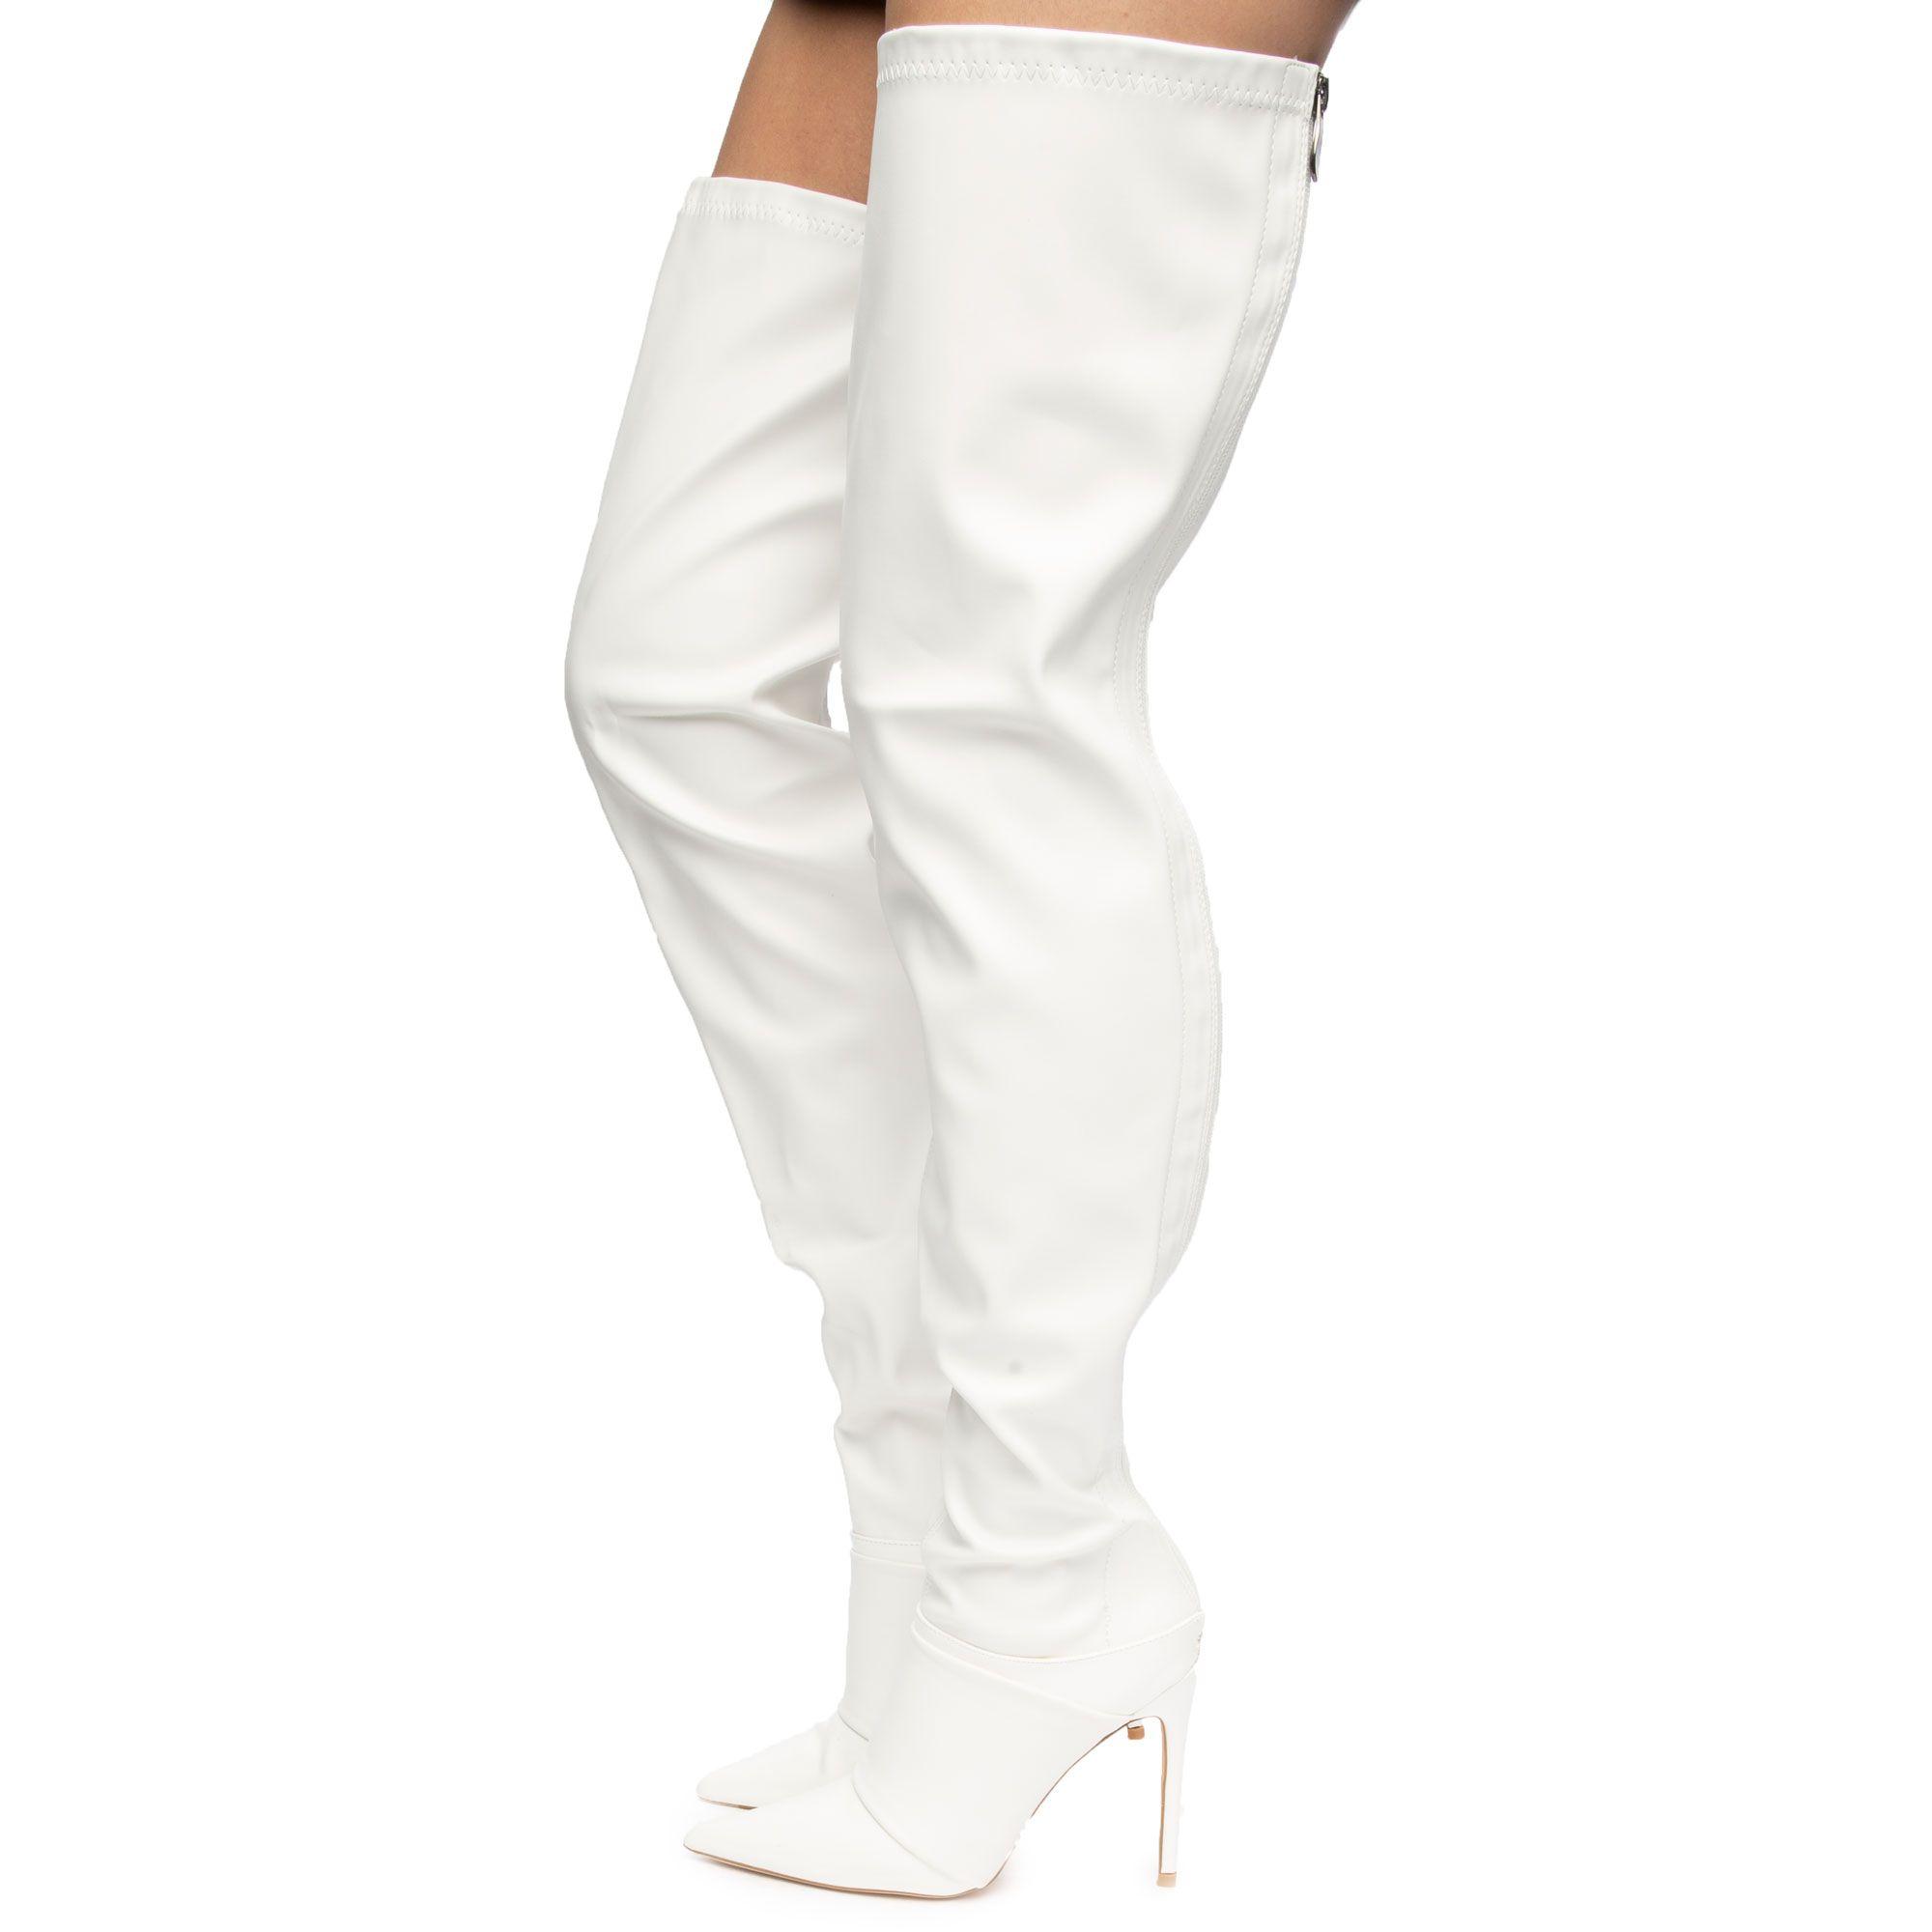 Tyris-1 Thigh High Boots White